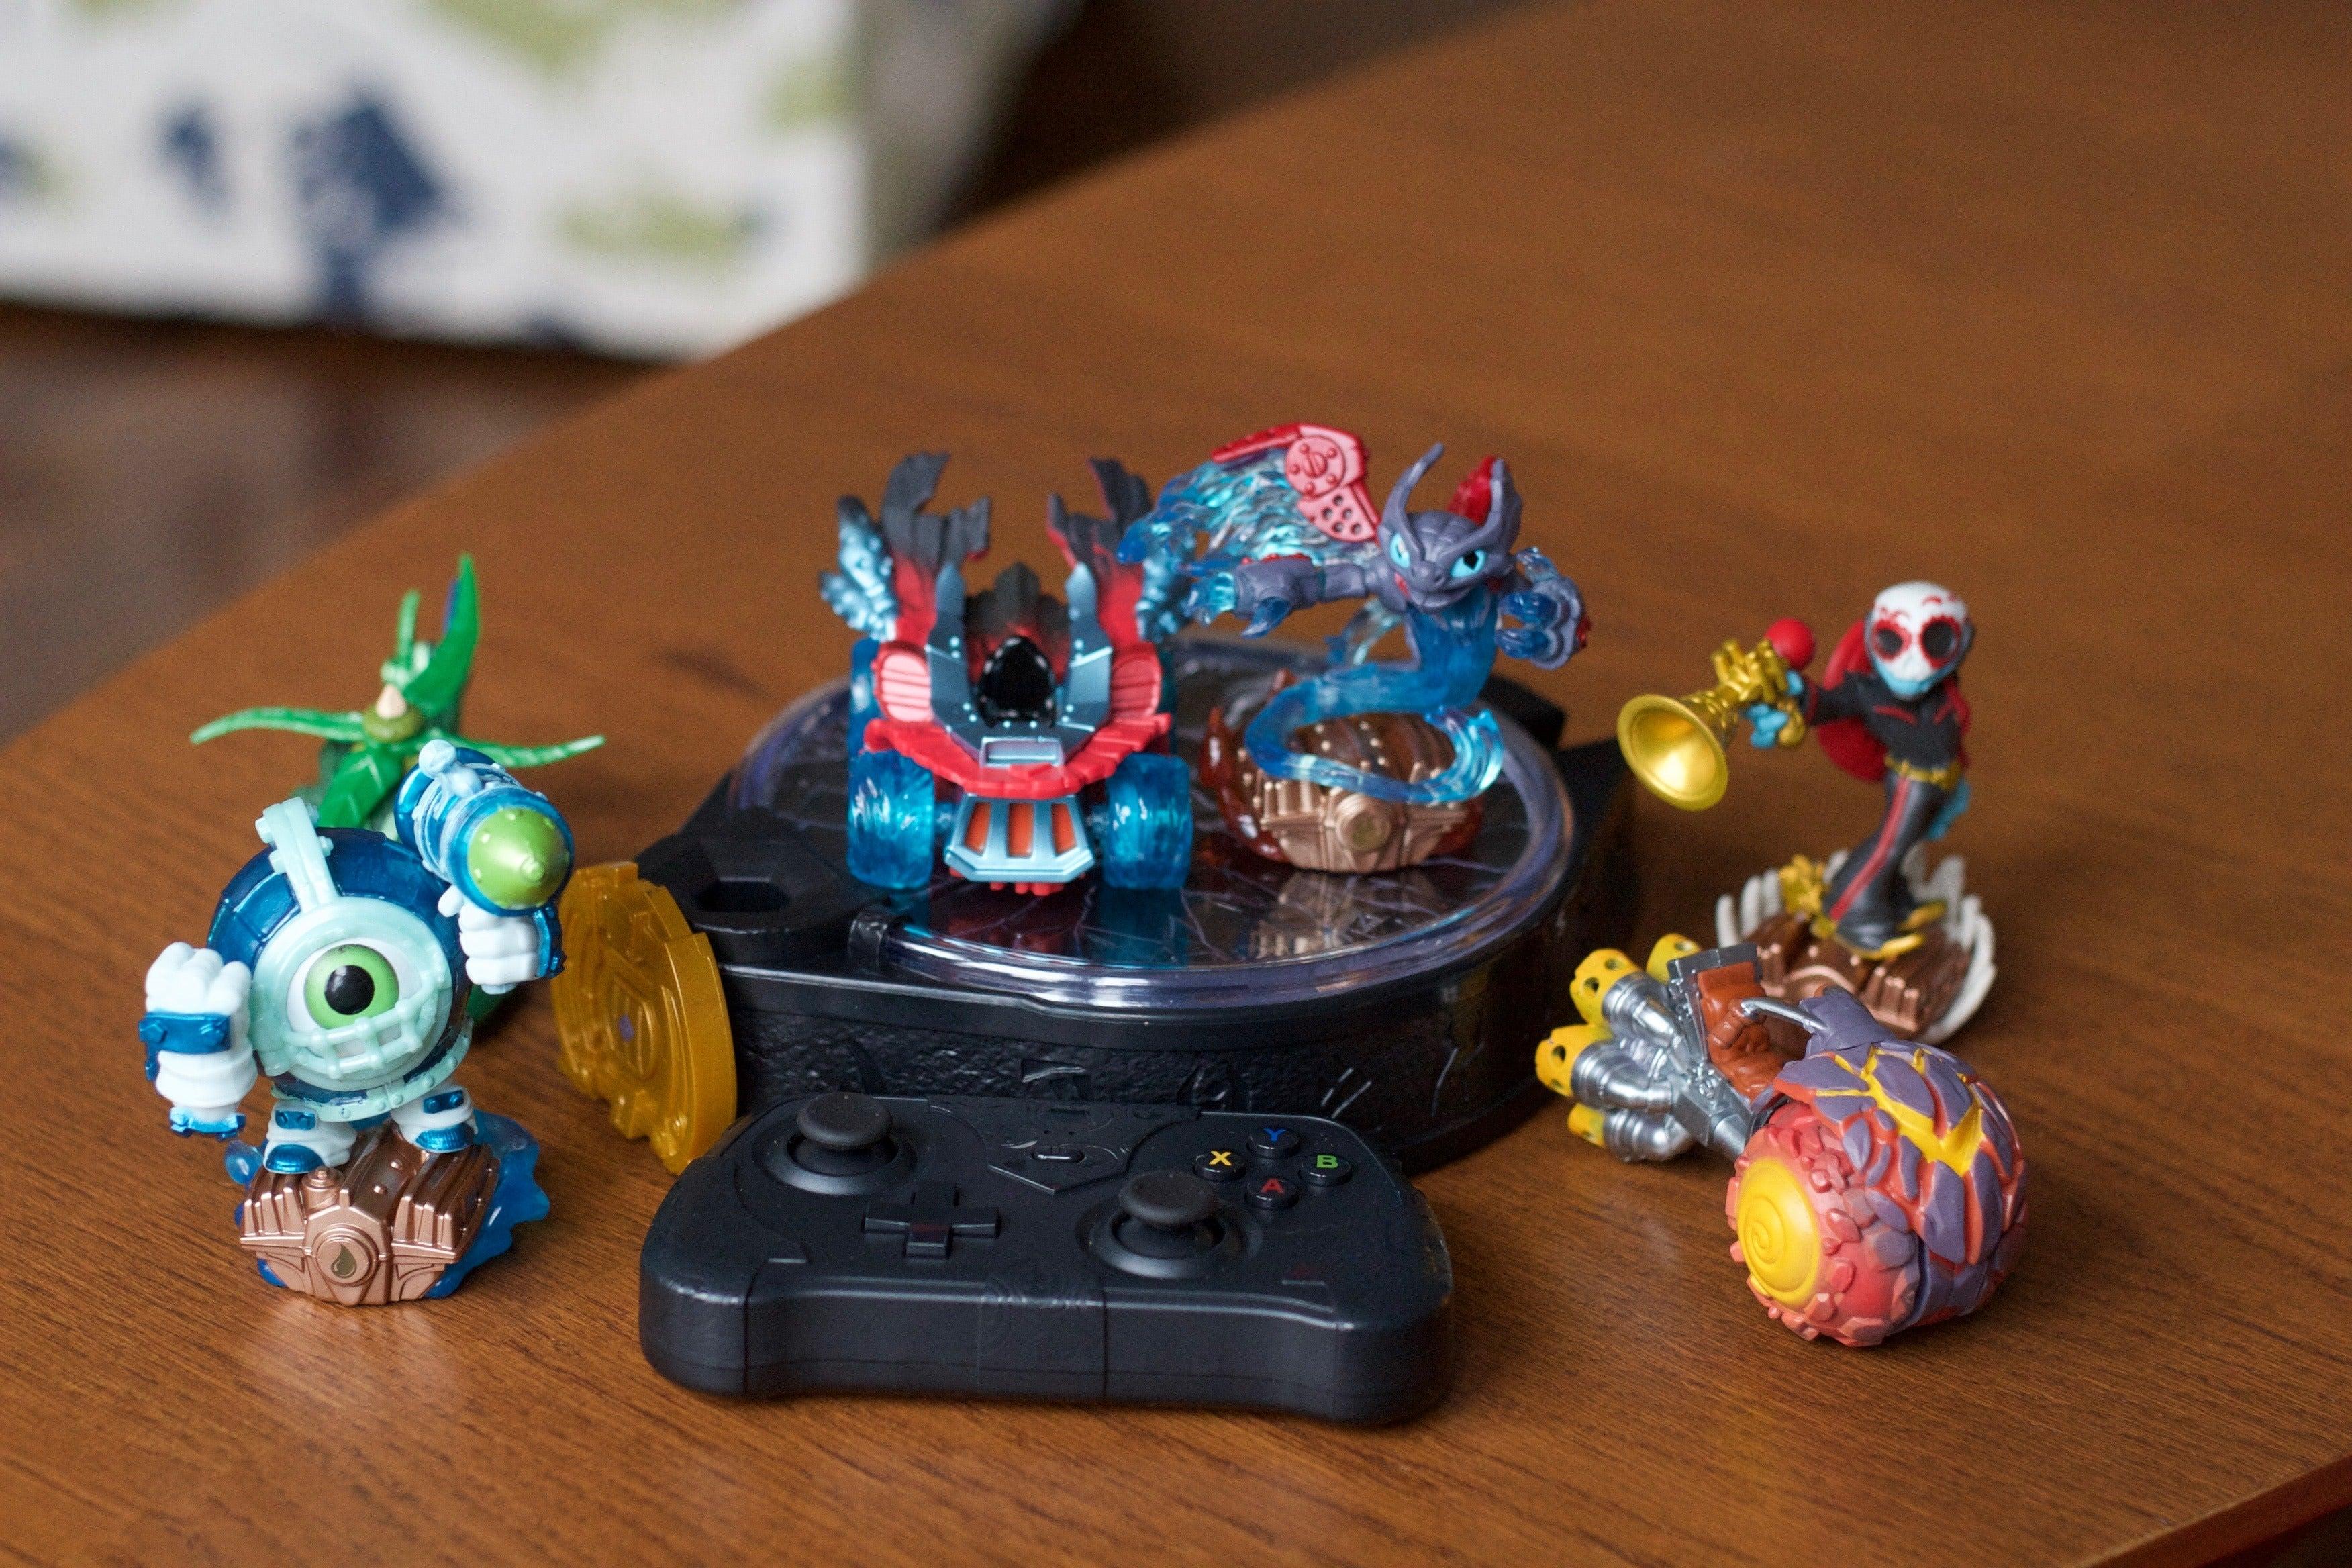 Apple Tv Toys To Life Disney Infinity 3 0 Vs Skylanders